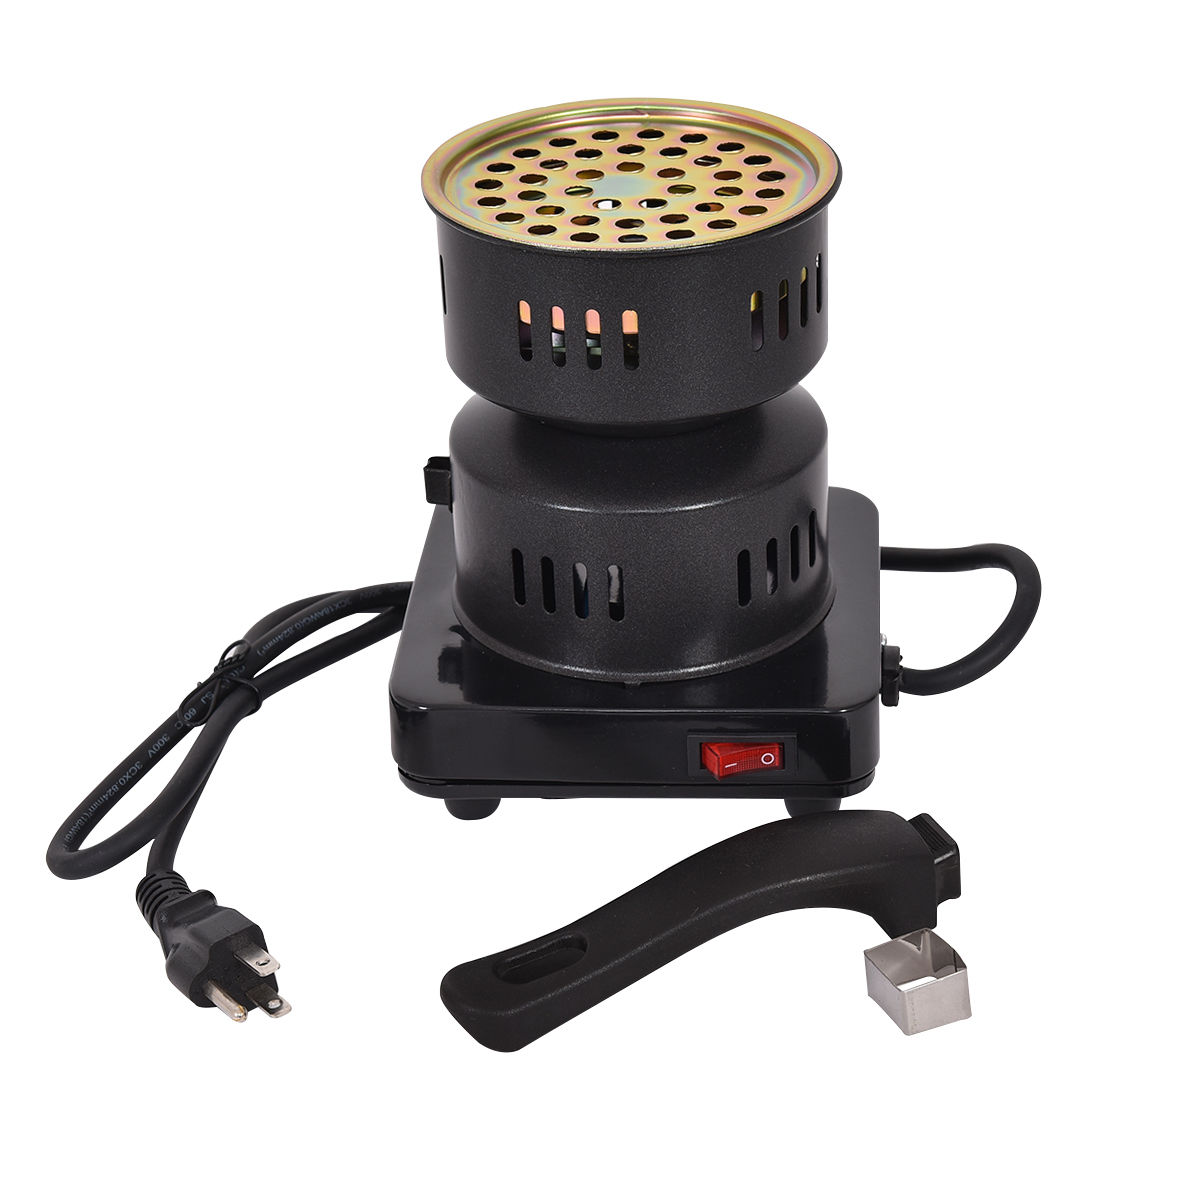 Gymax Electric Coal Starter Hookah Shisha Nargila Heater Stove Charcoal Burner BBQ